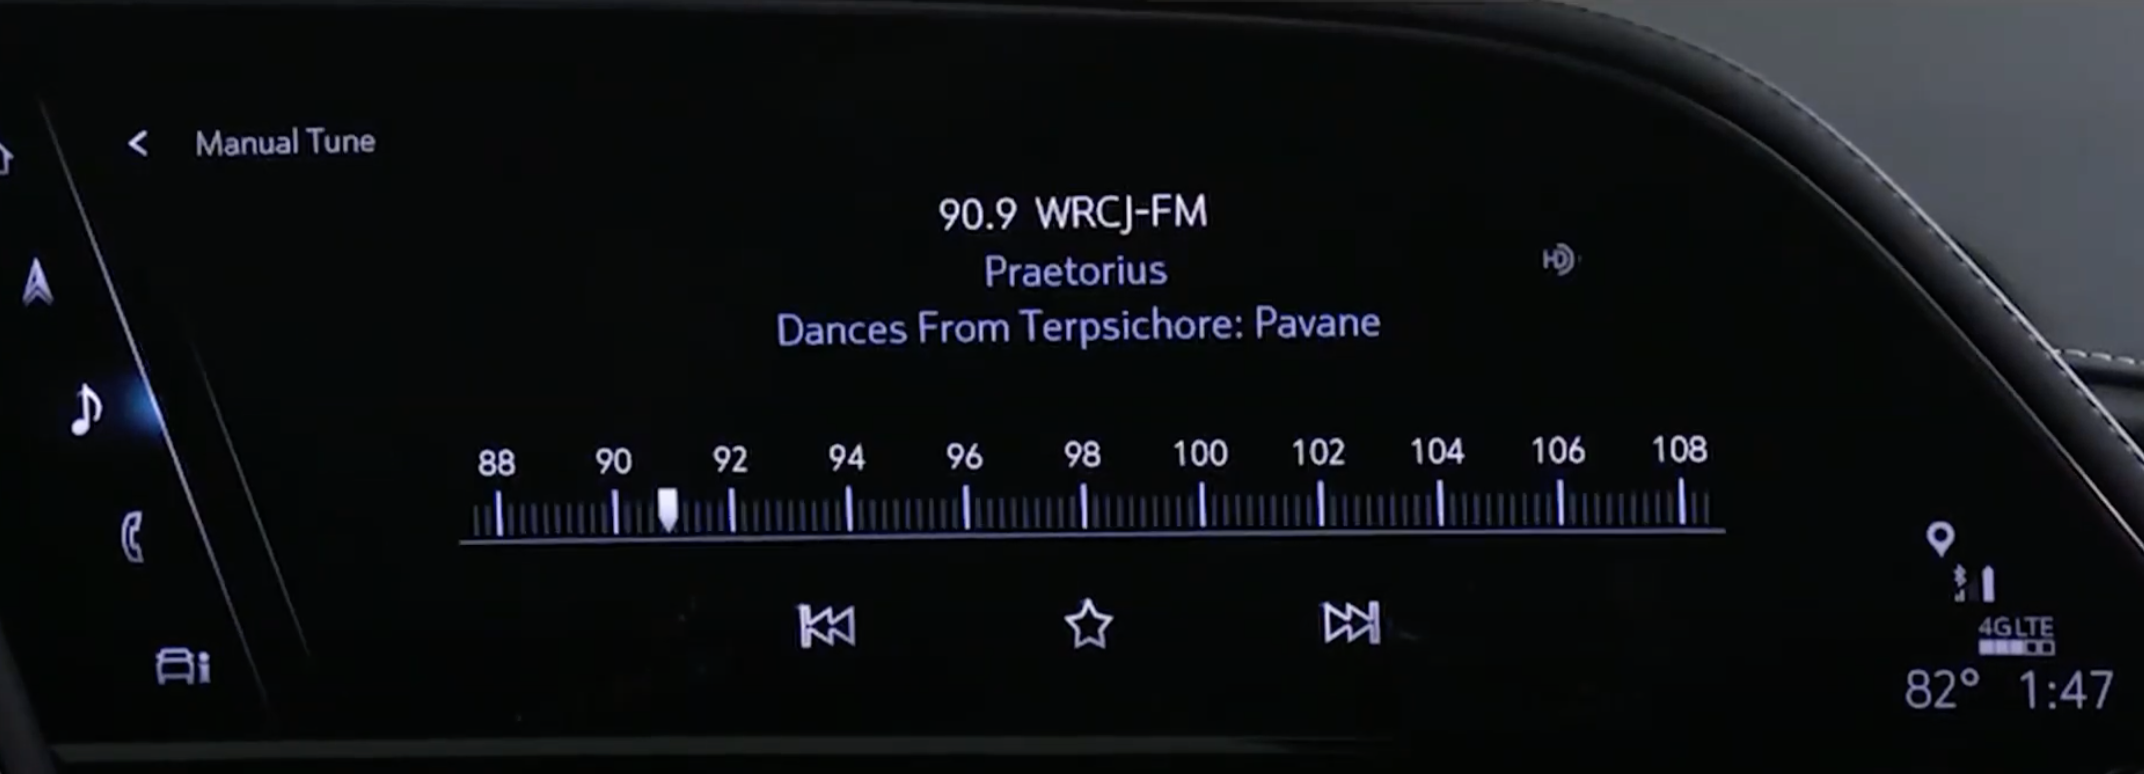 Browsing through radio channels through a slider